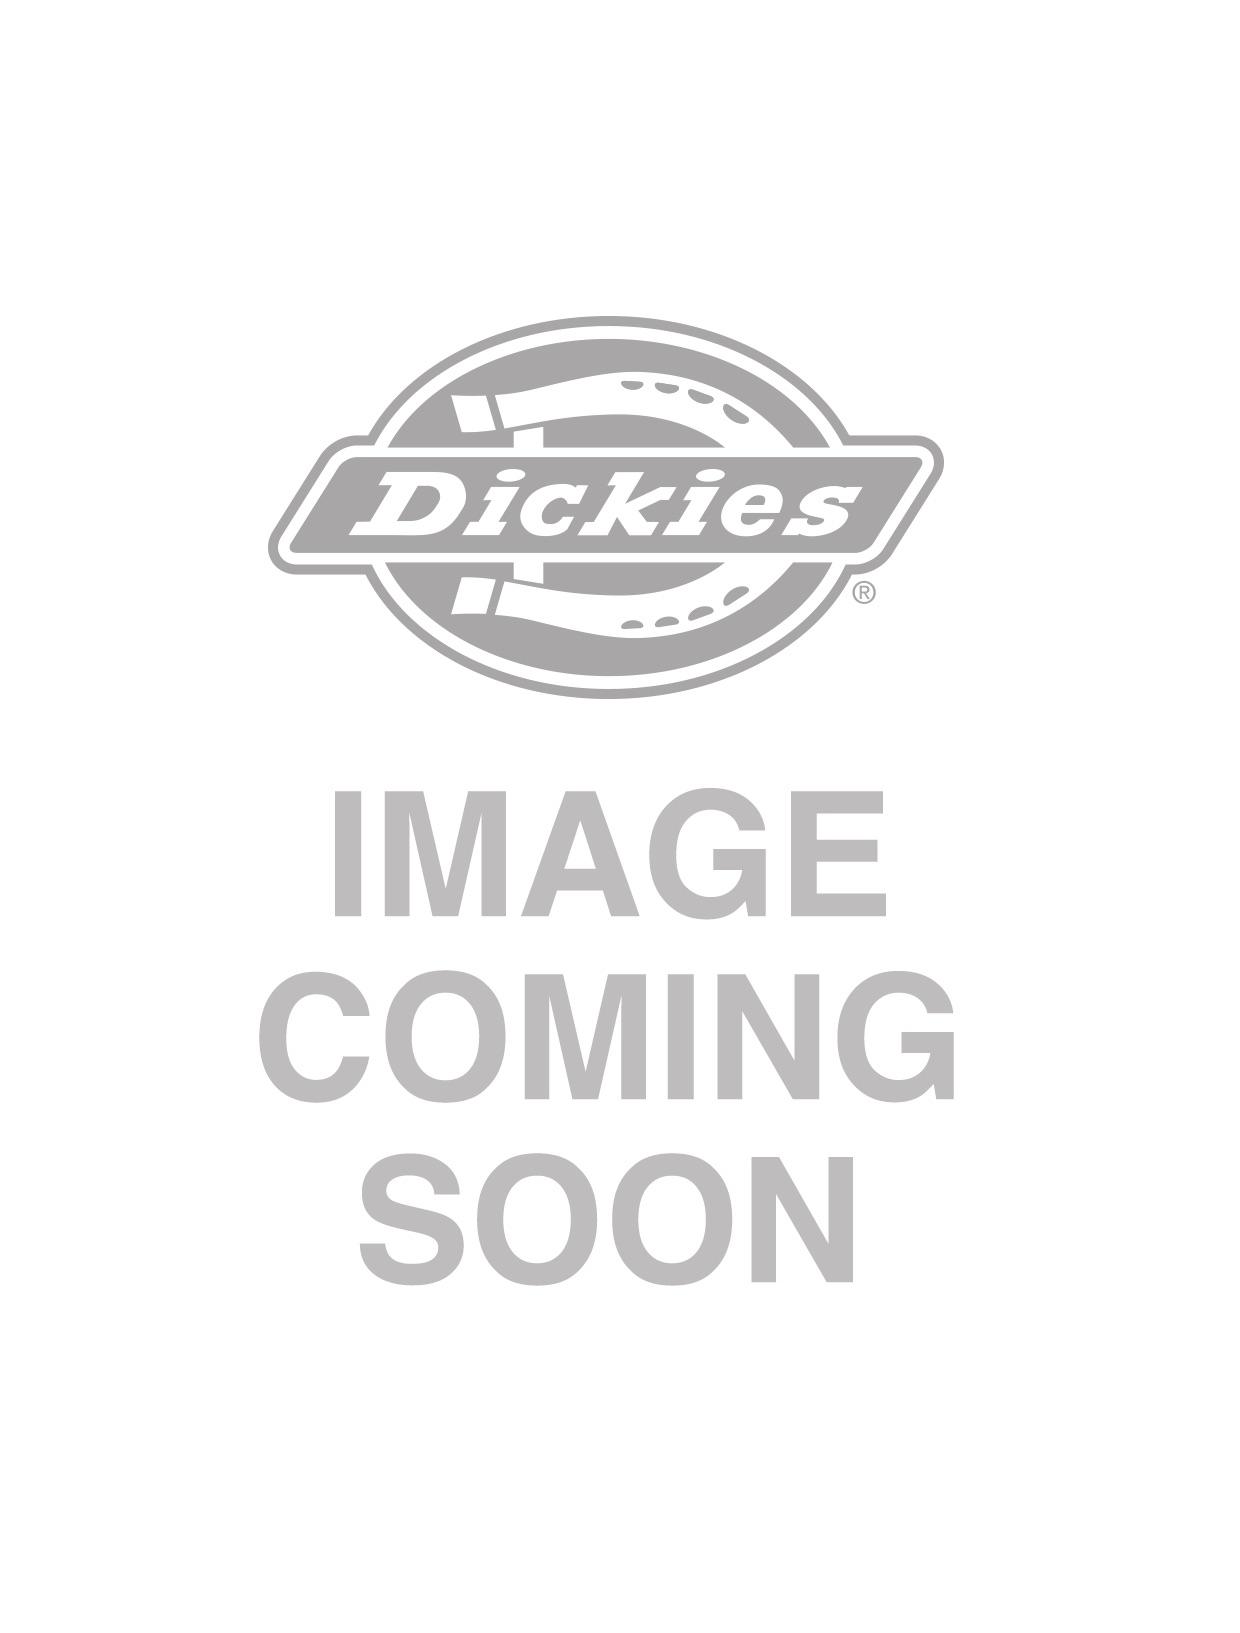 Dickies Leesburg Cap